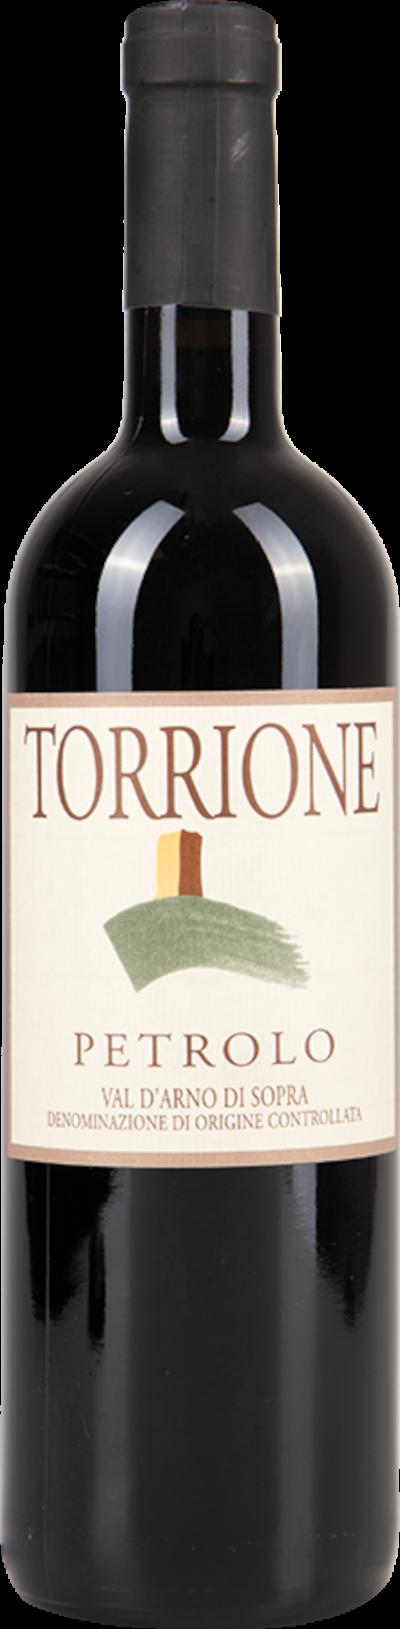 Petrolo - Torrione Toscana IGT